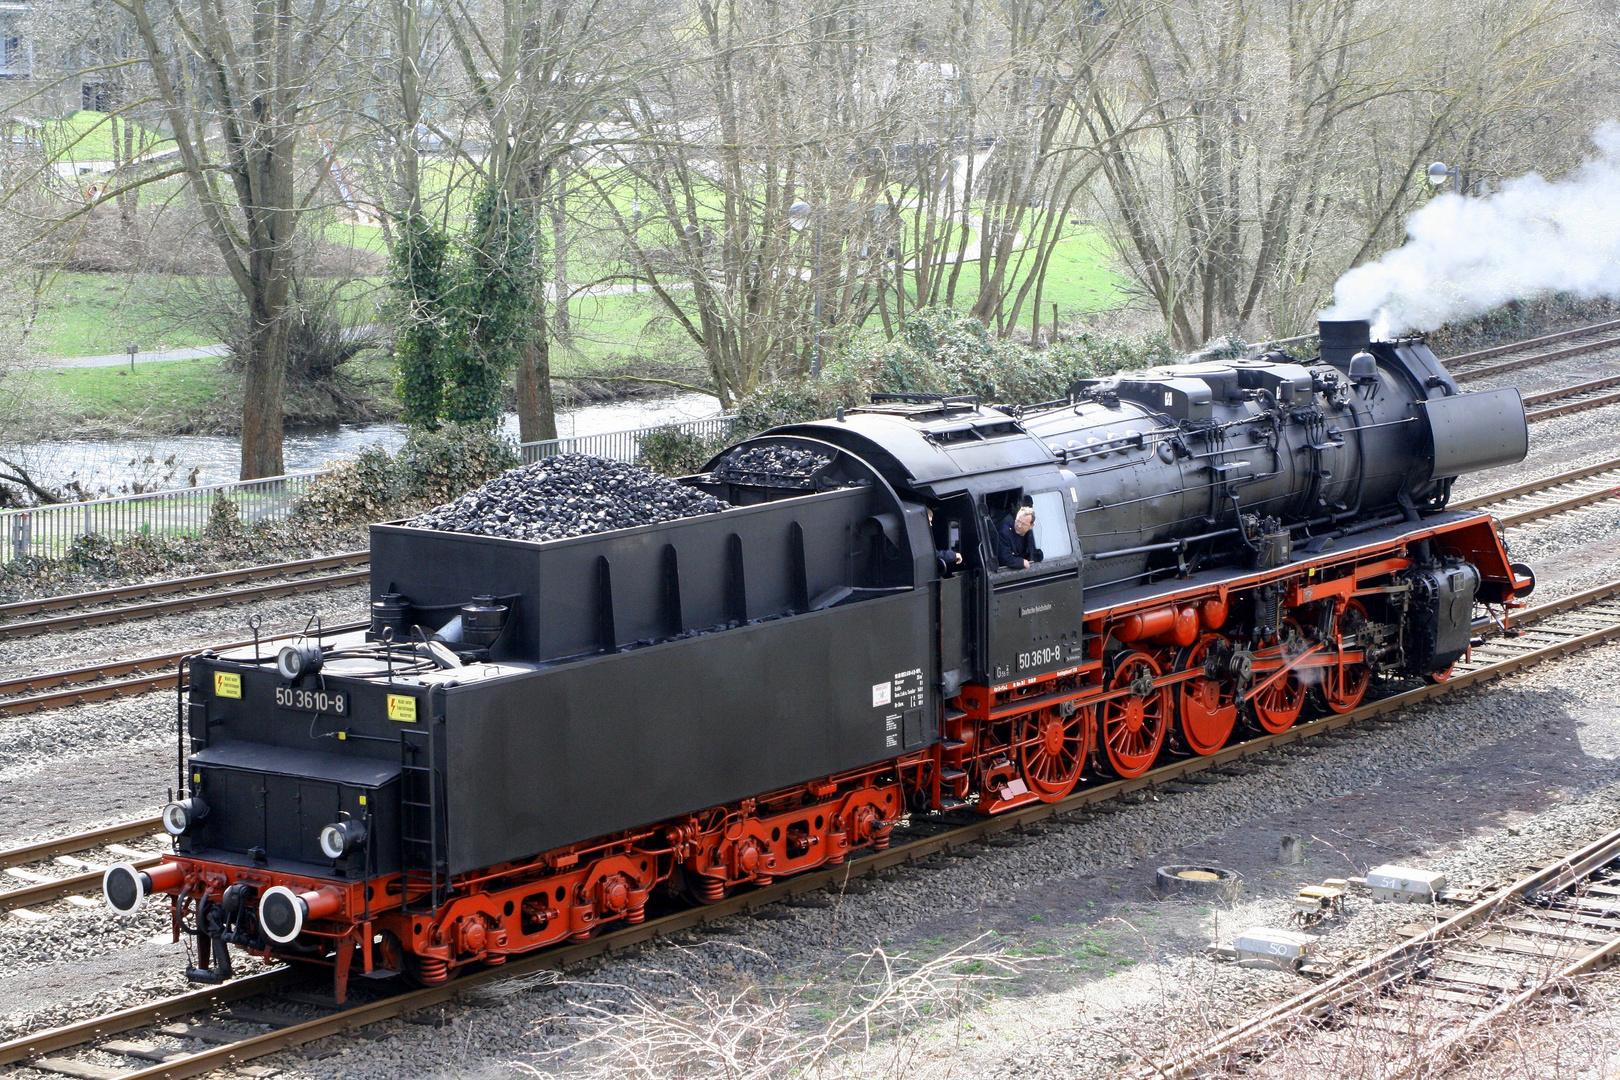 Dampflok 50 3610-8